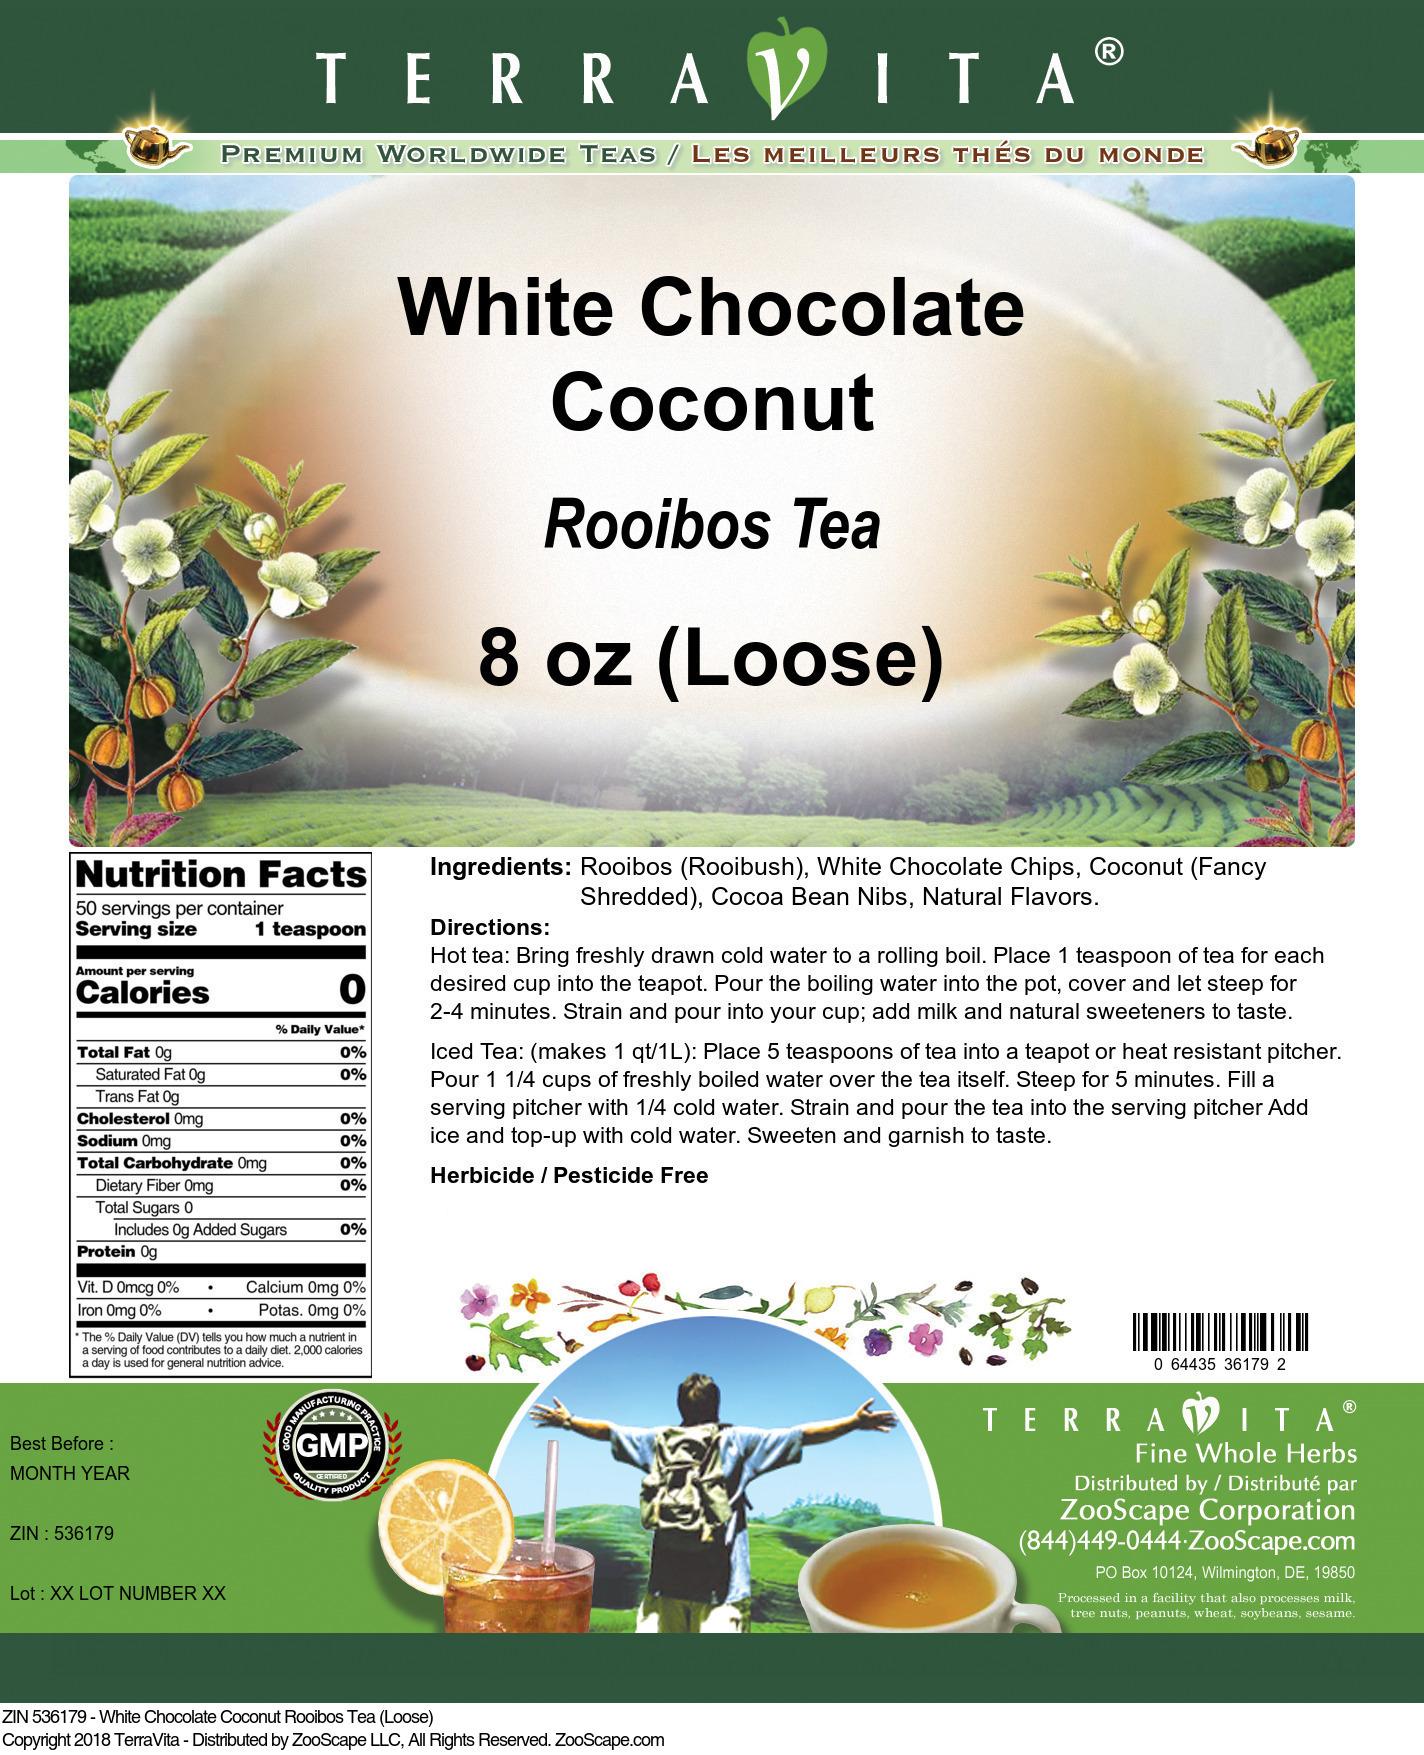 White Chocolate Coconut Rooibos Tea (Loose)